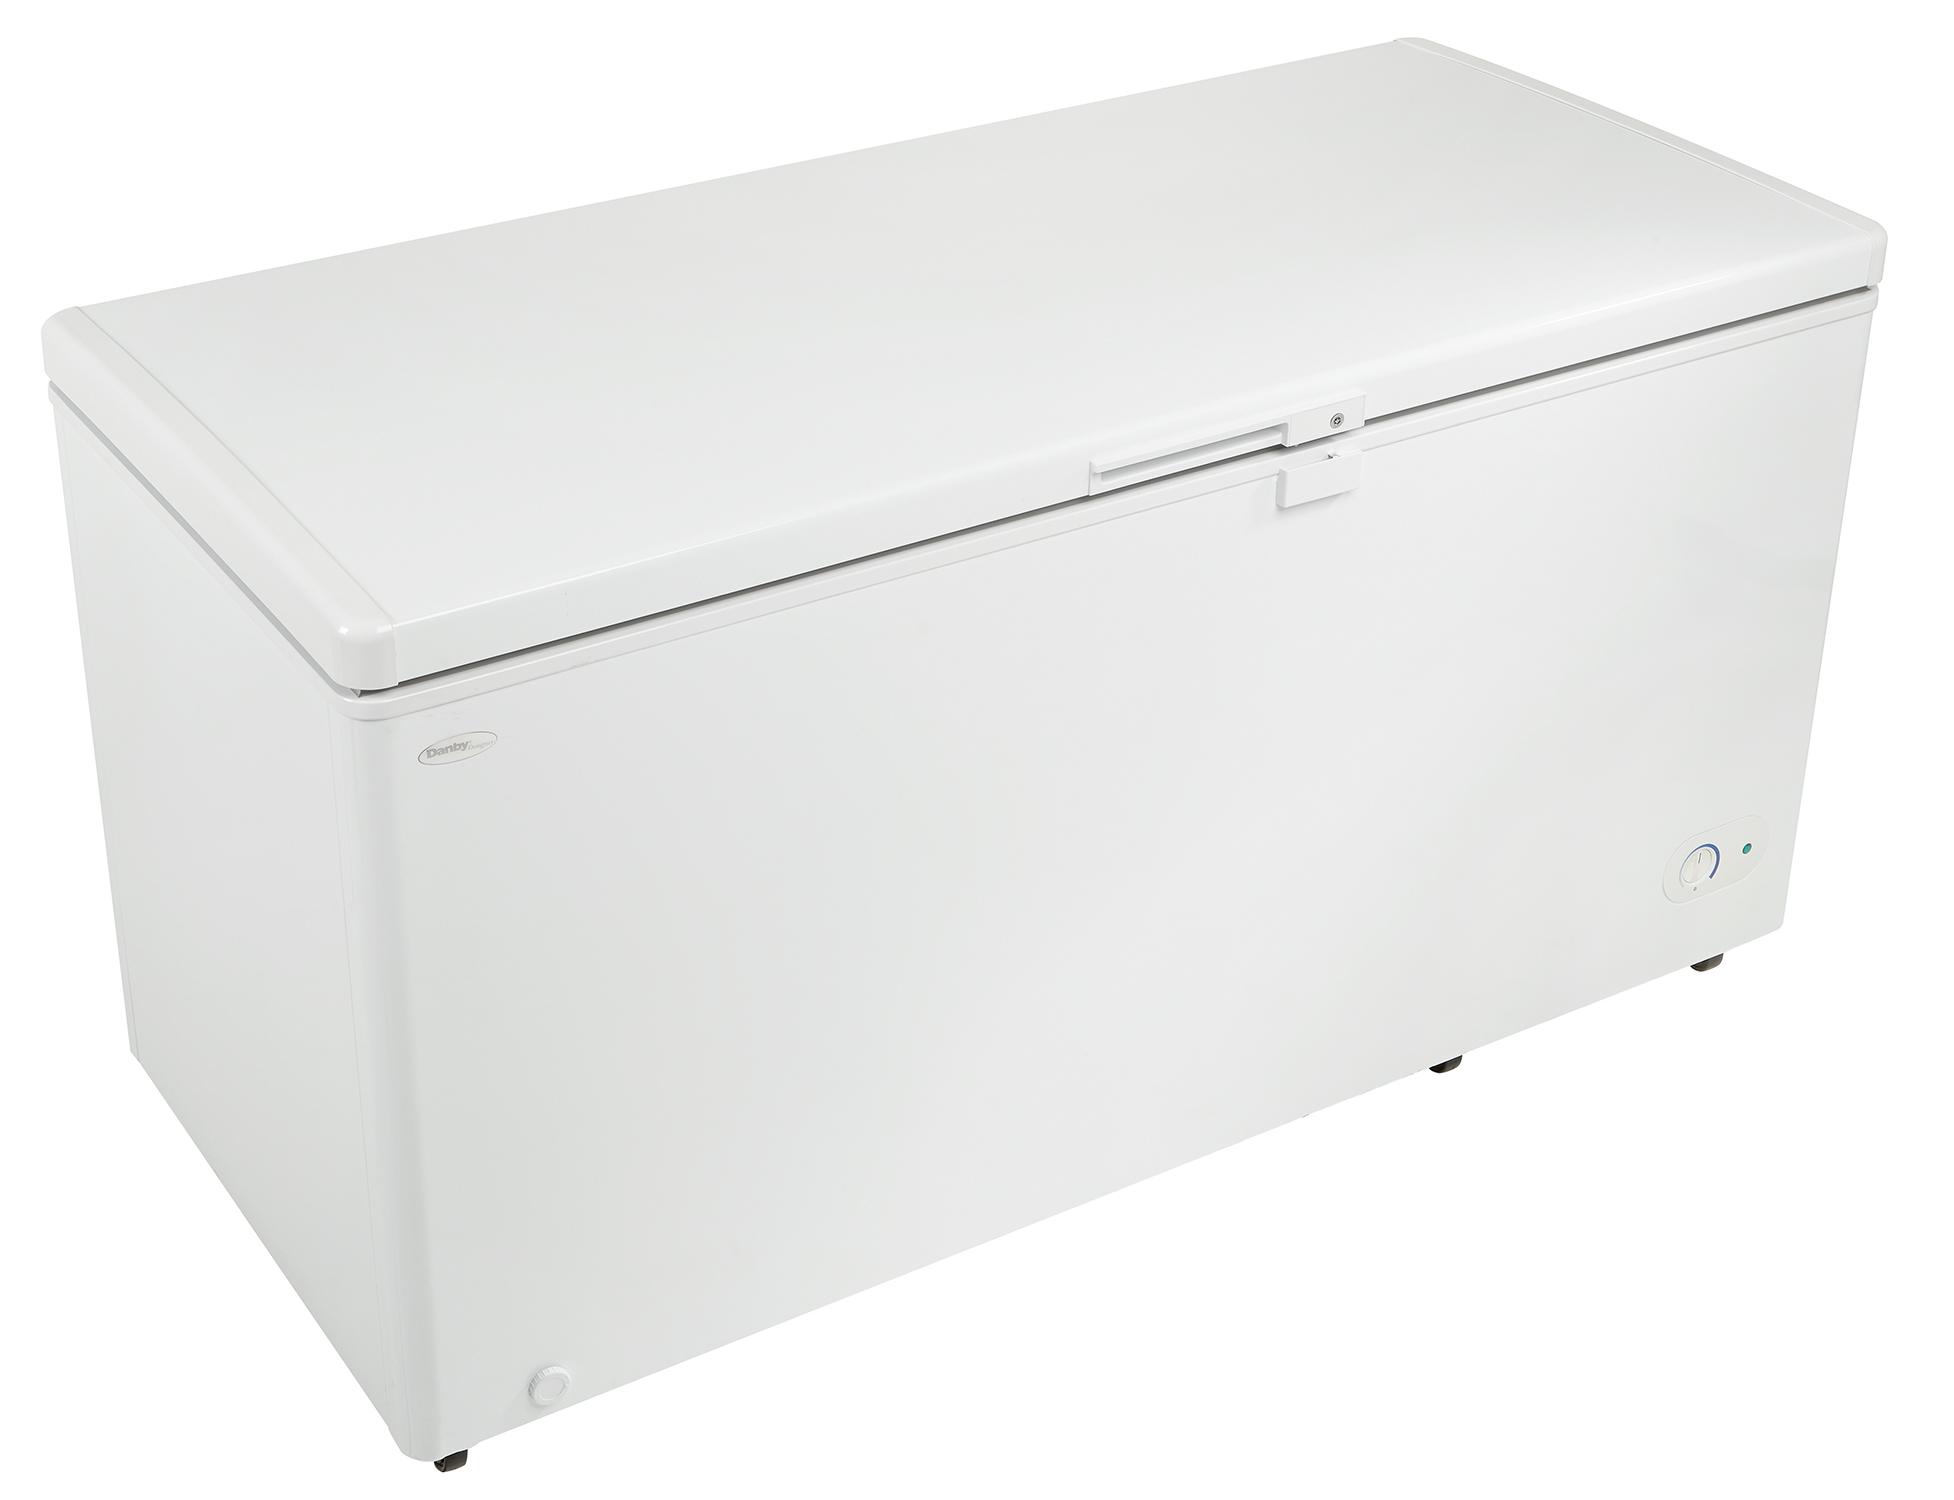 22501 – freezer – DCF145A1WDD – angled